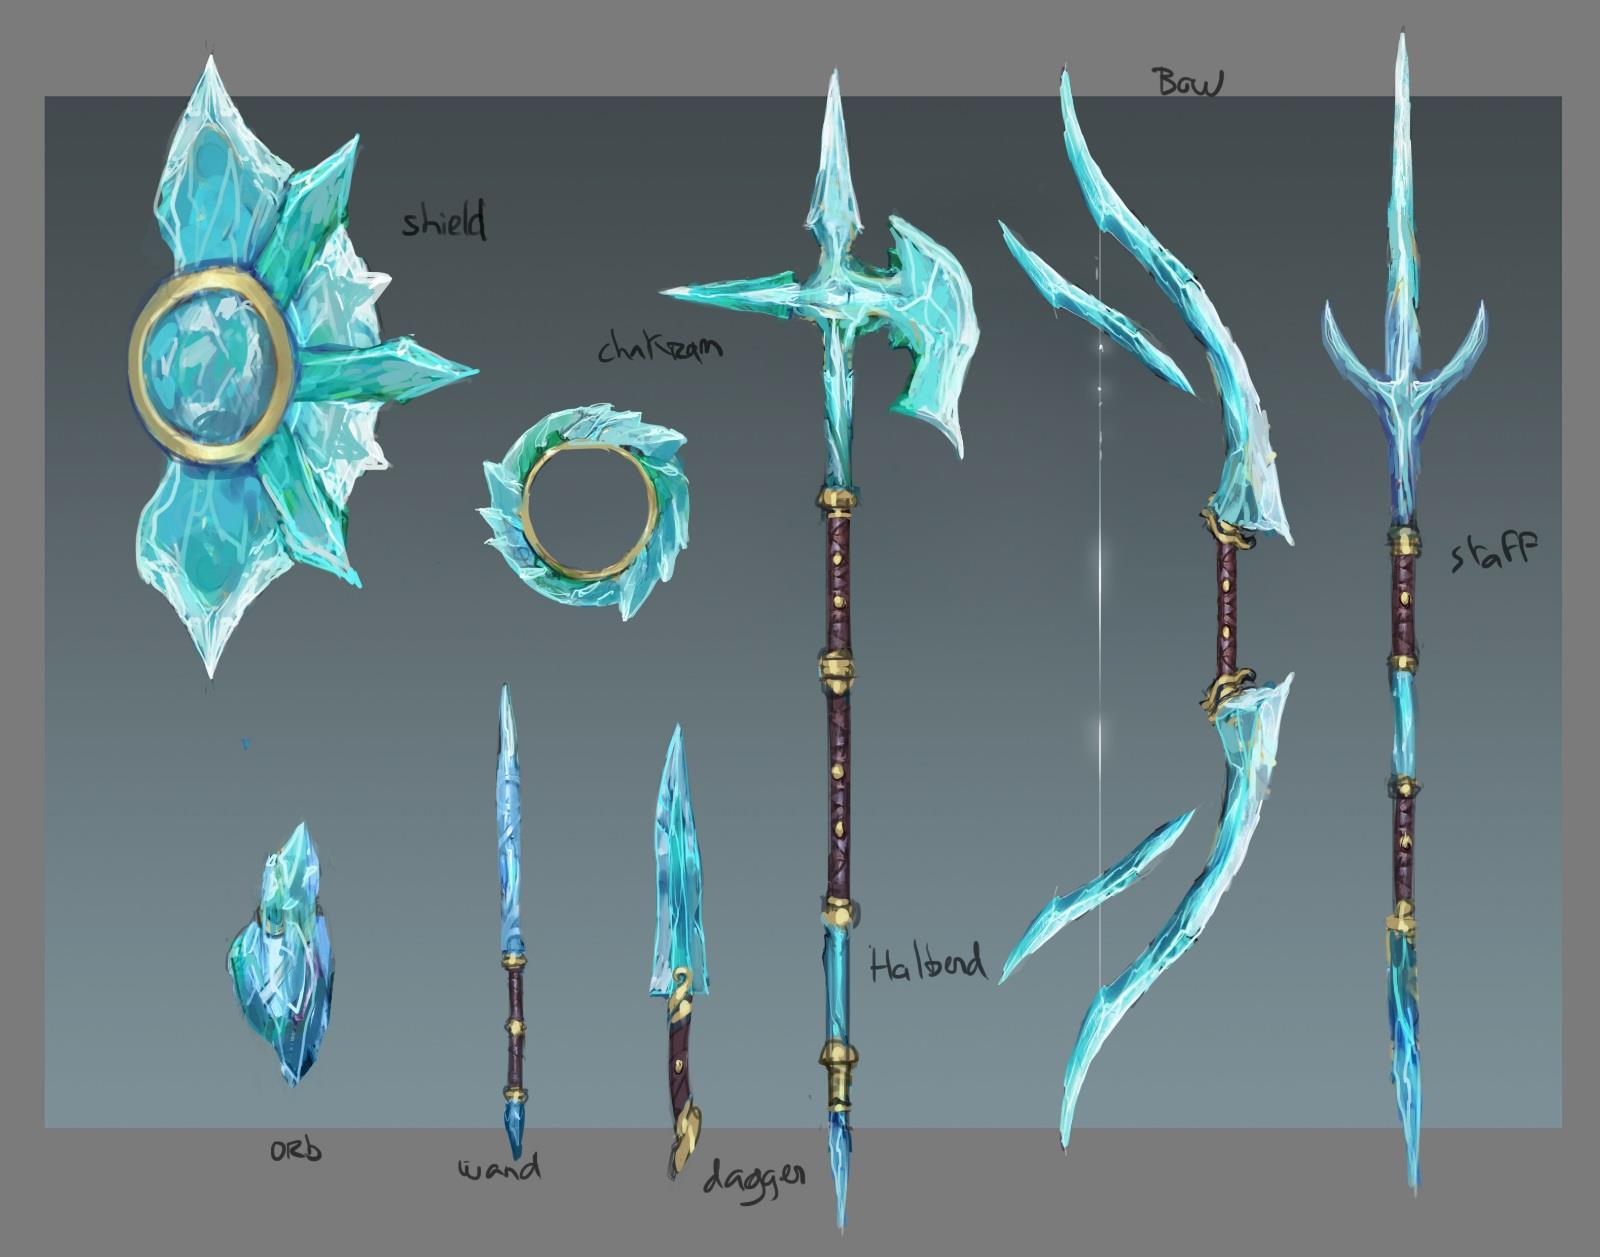 Crystal Wand Runescape Wiki Fandom Powered By Wikia